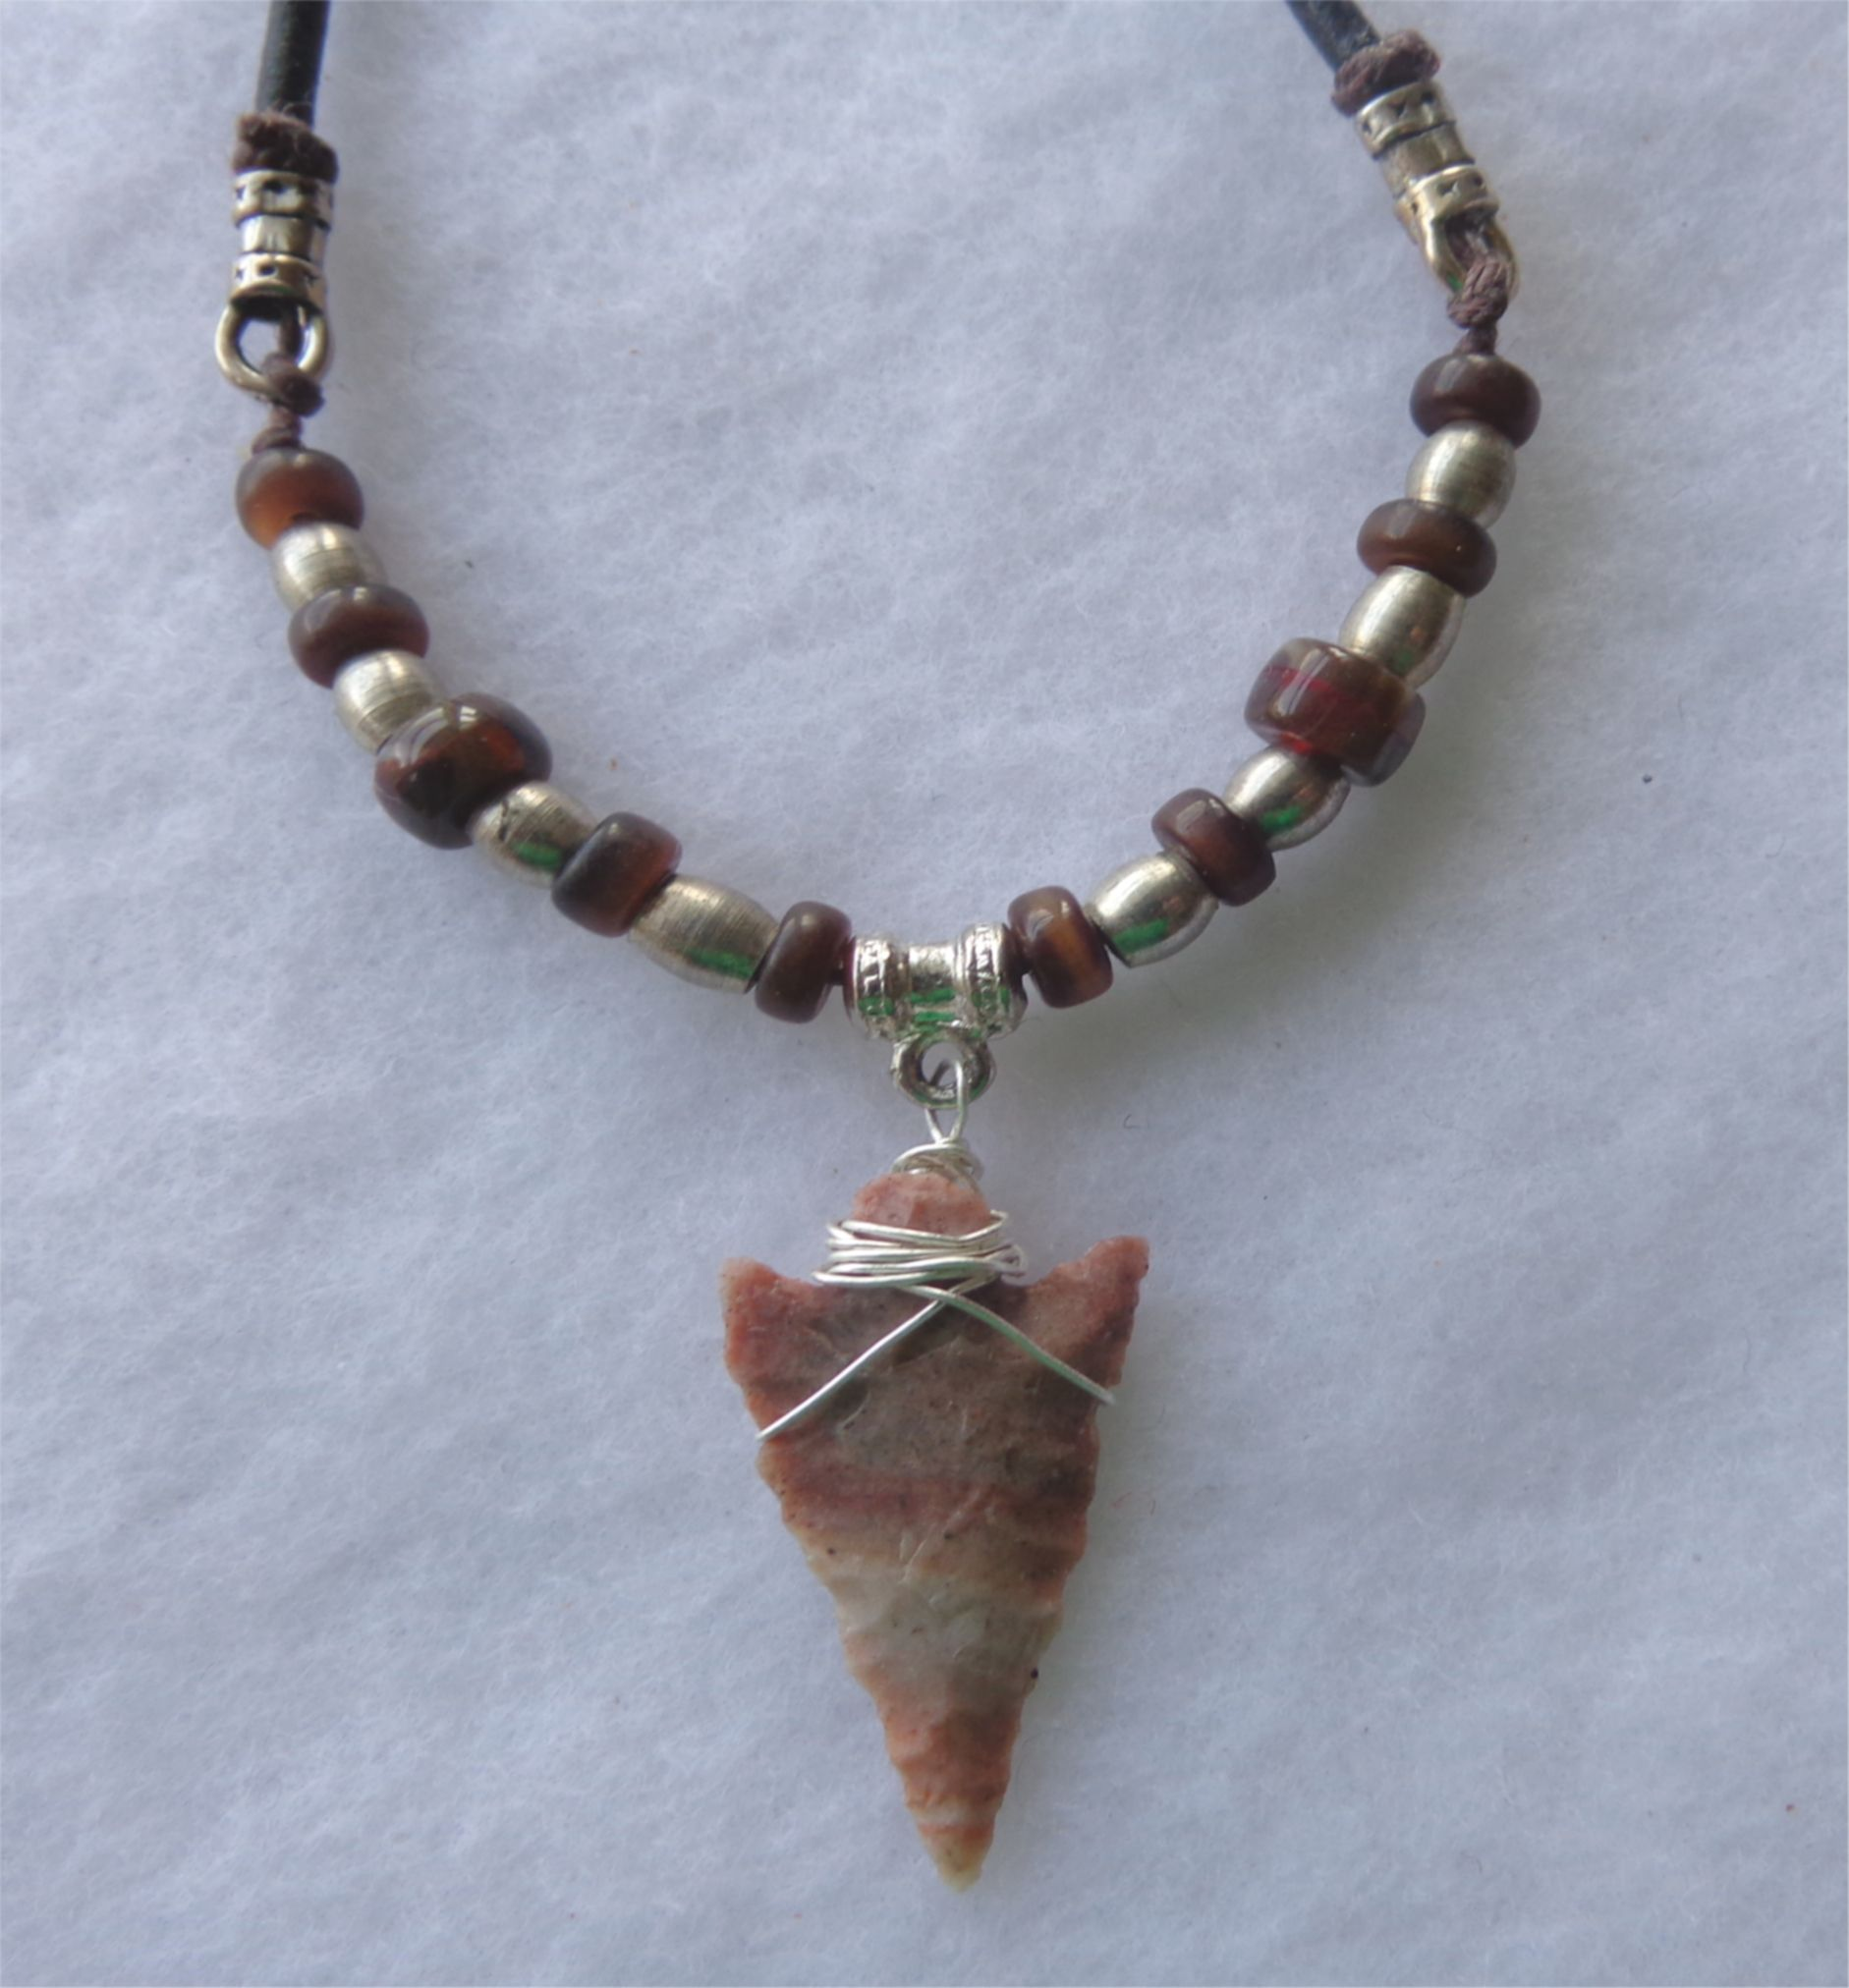 4 REAL STONE ARROWHEAD NECKLACE western fashion jewelry stones arrow head NEW